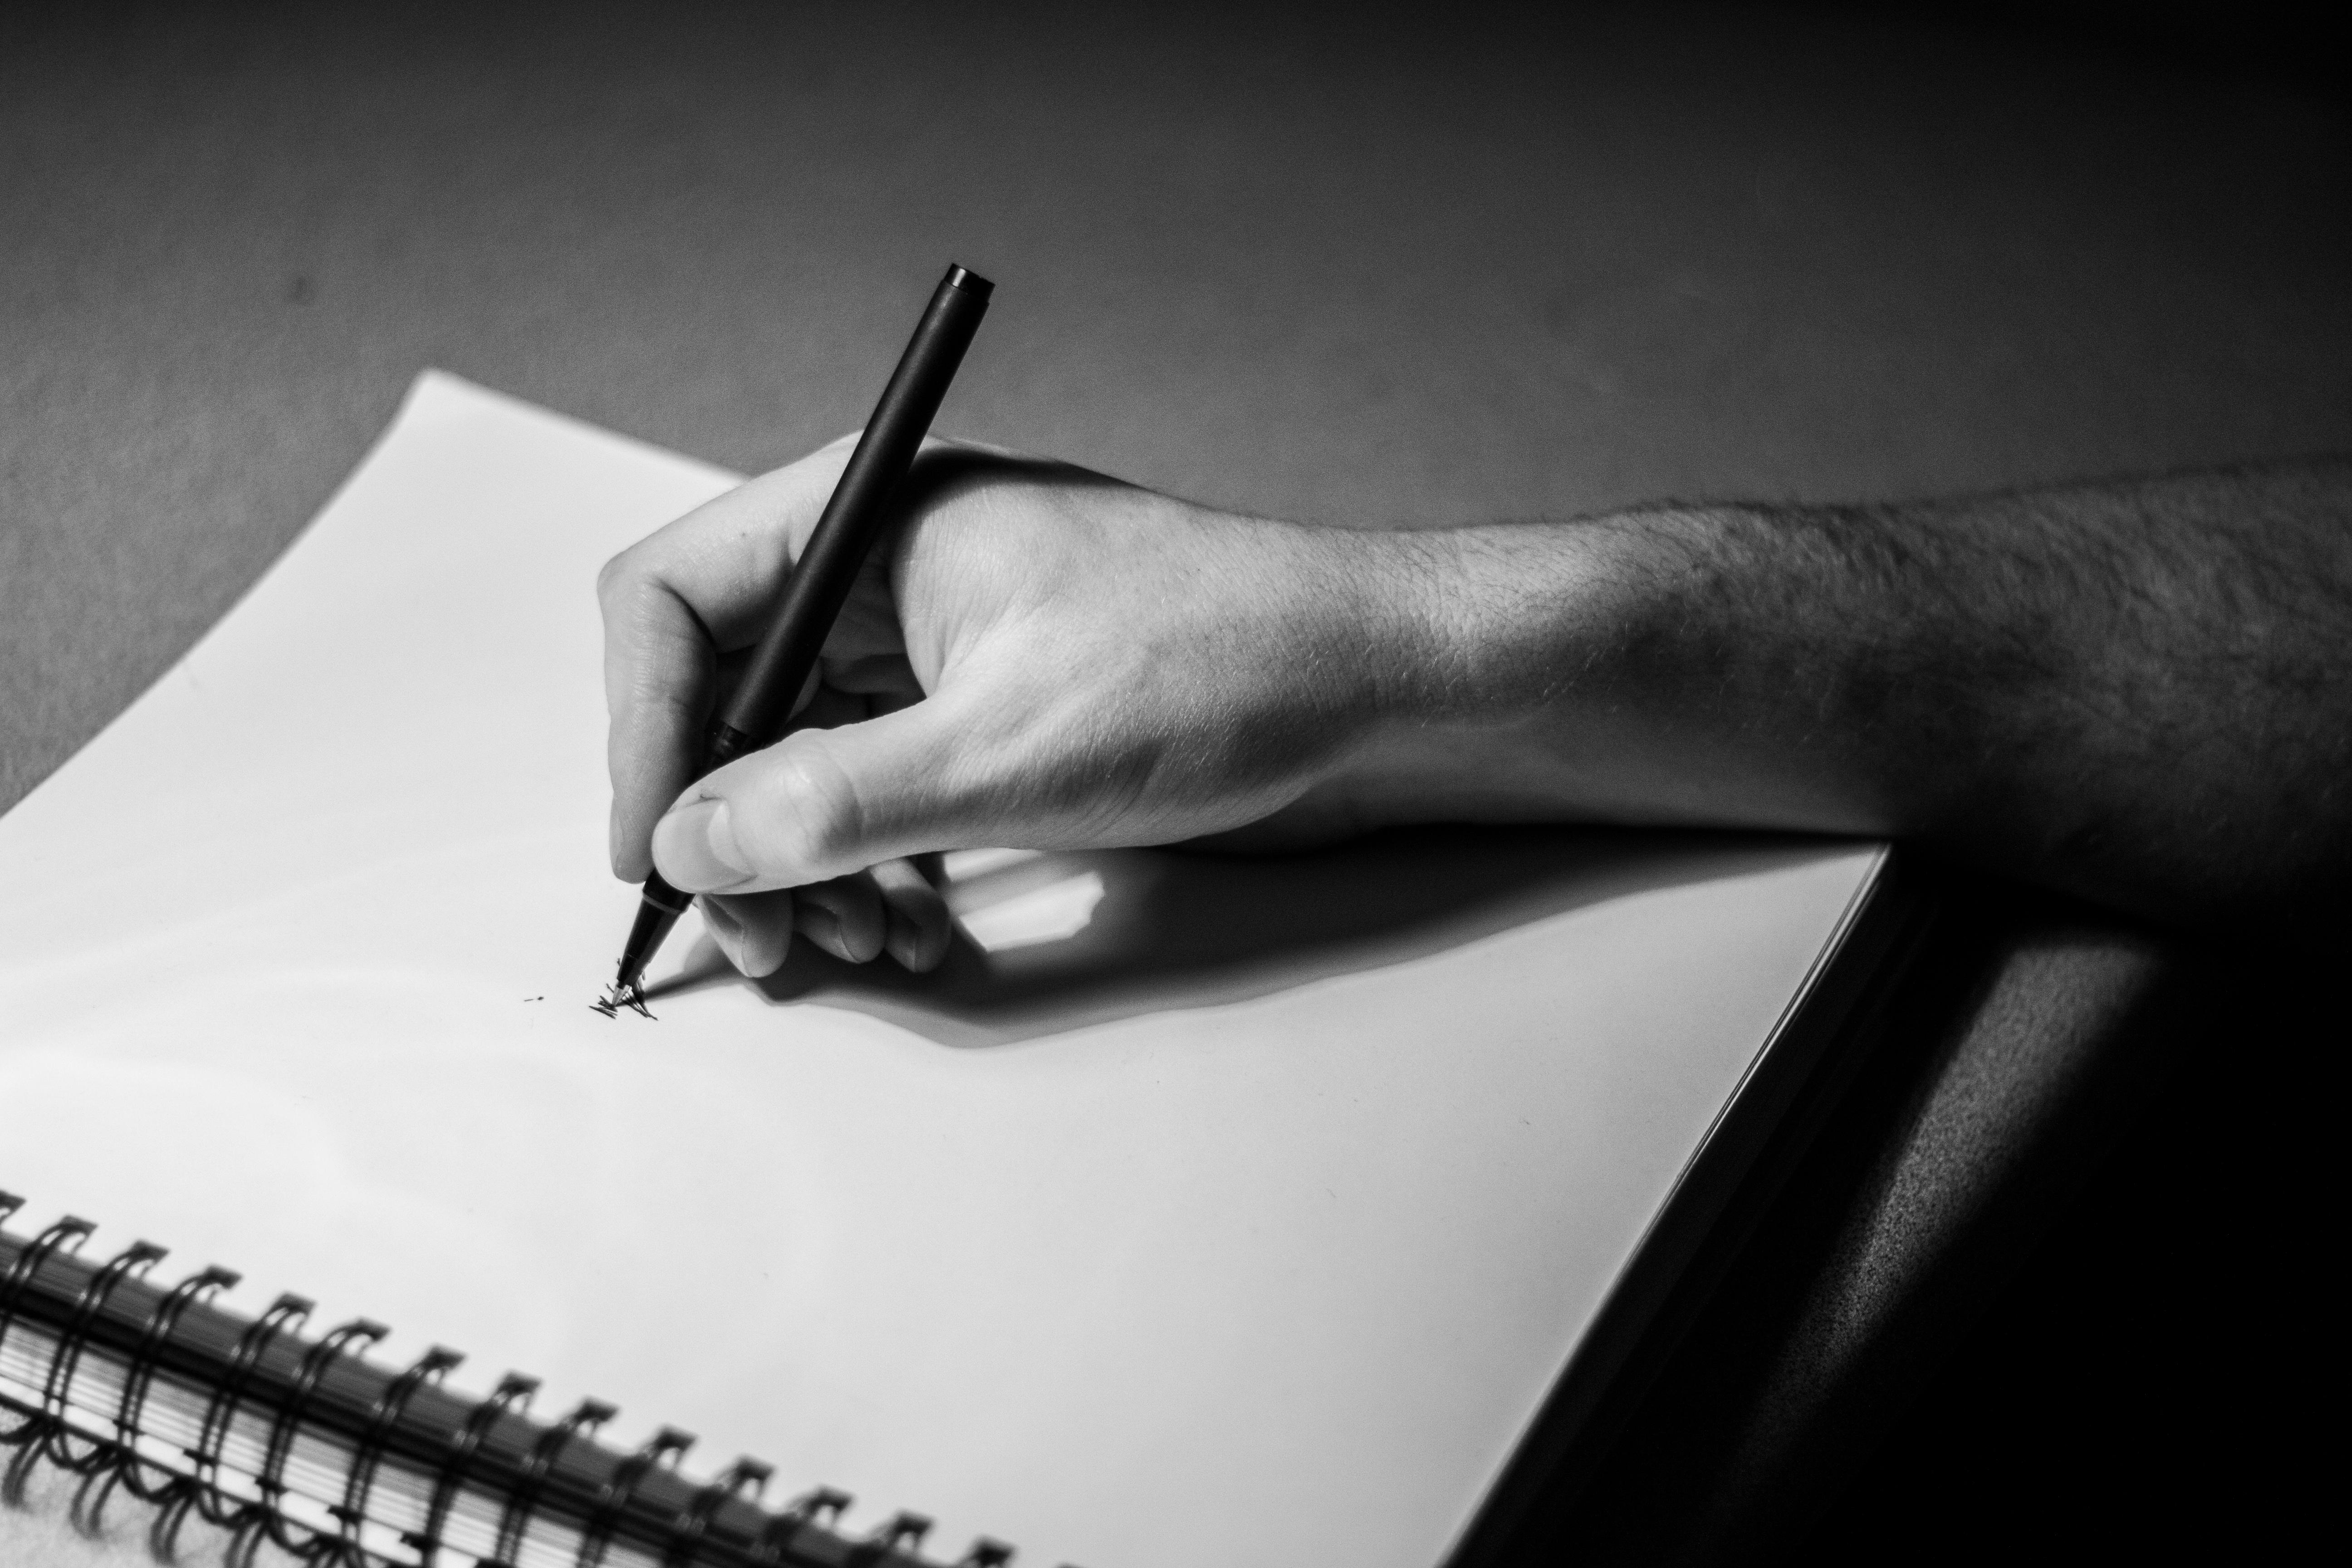 Картинка пишущего мужчины